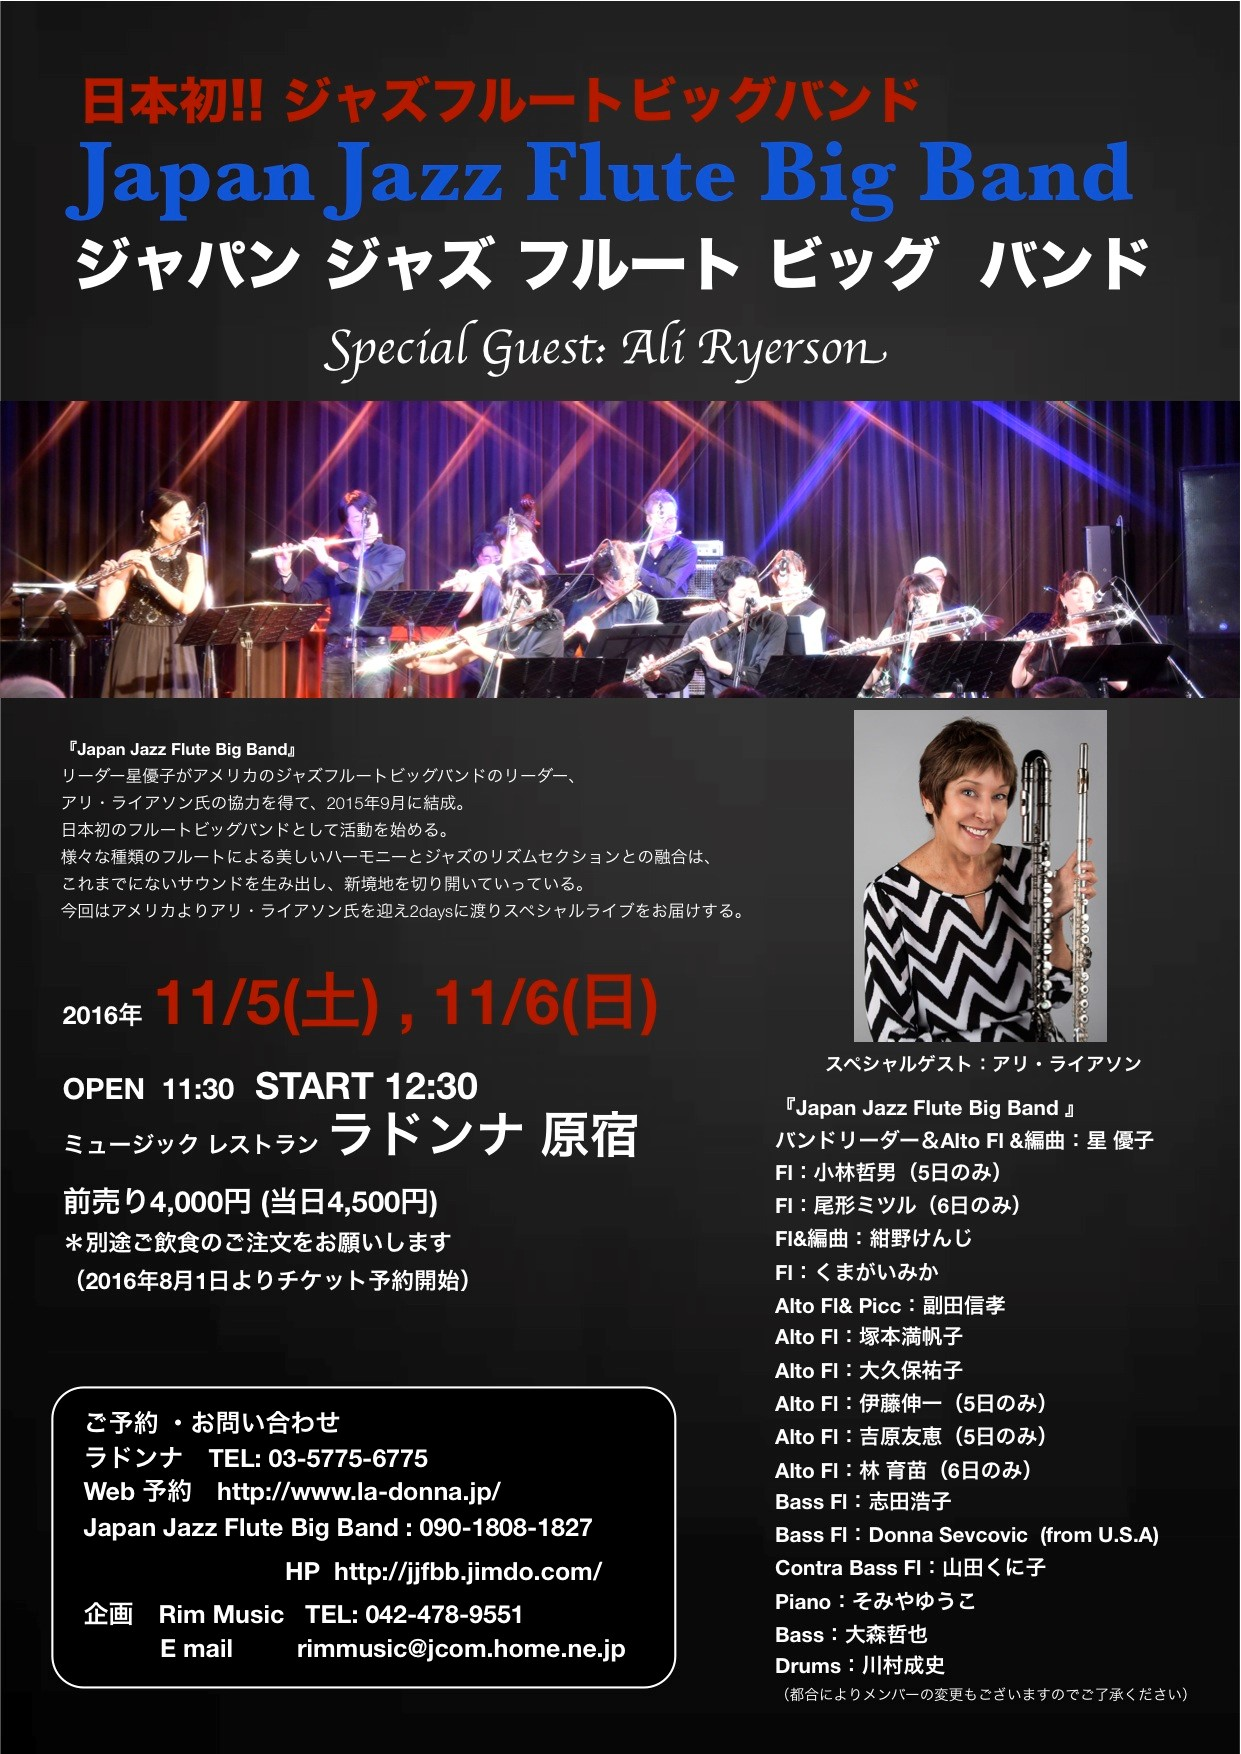 Japan Jazz Flute Big Band ~スペシャルゲスト:アリ・ライアソン~